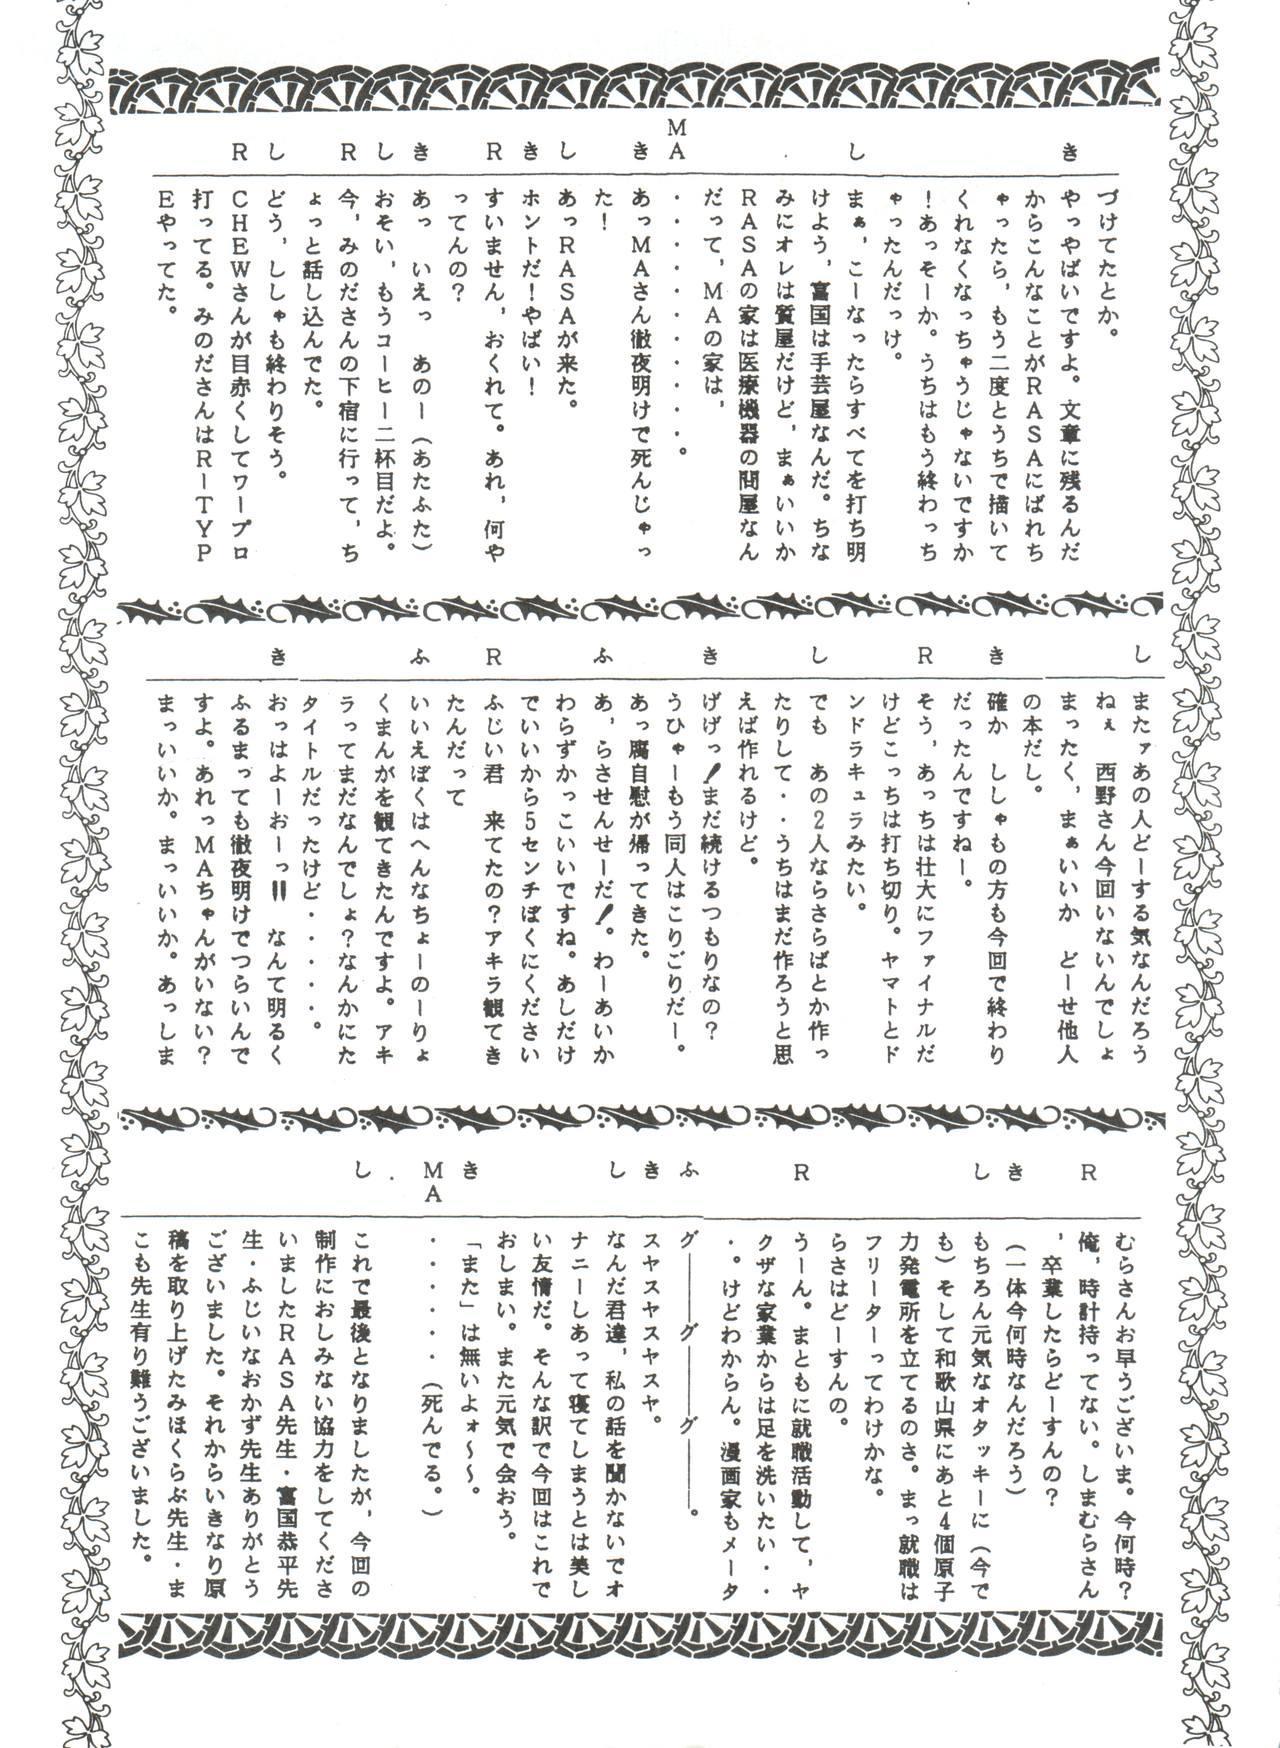 [Studio Fuck (Various) Onapet 7 (Sonic Soldier Borgman, Gundam ZZ, Osomatsu-kun) 84